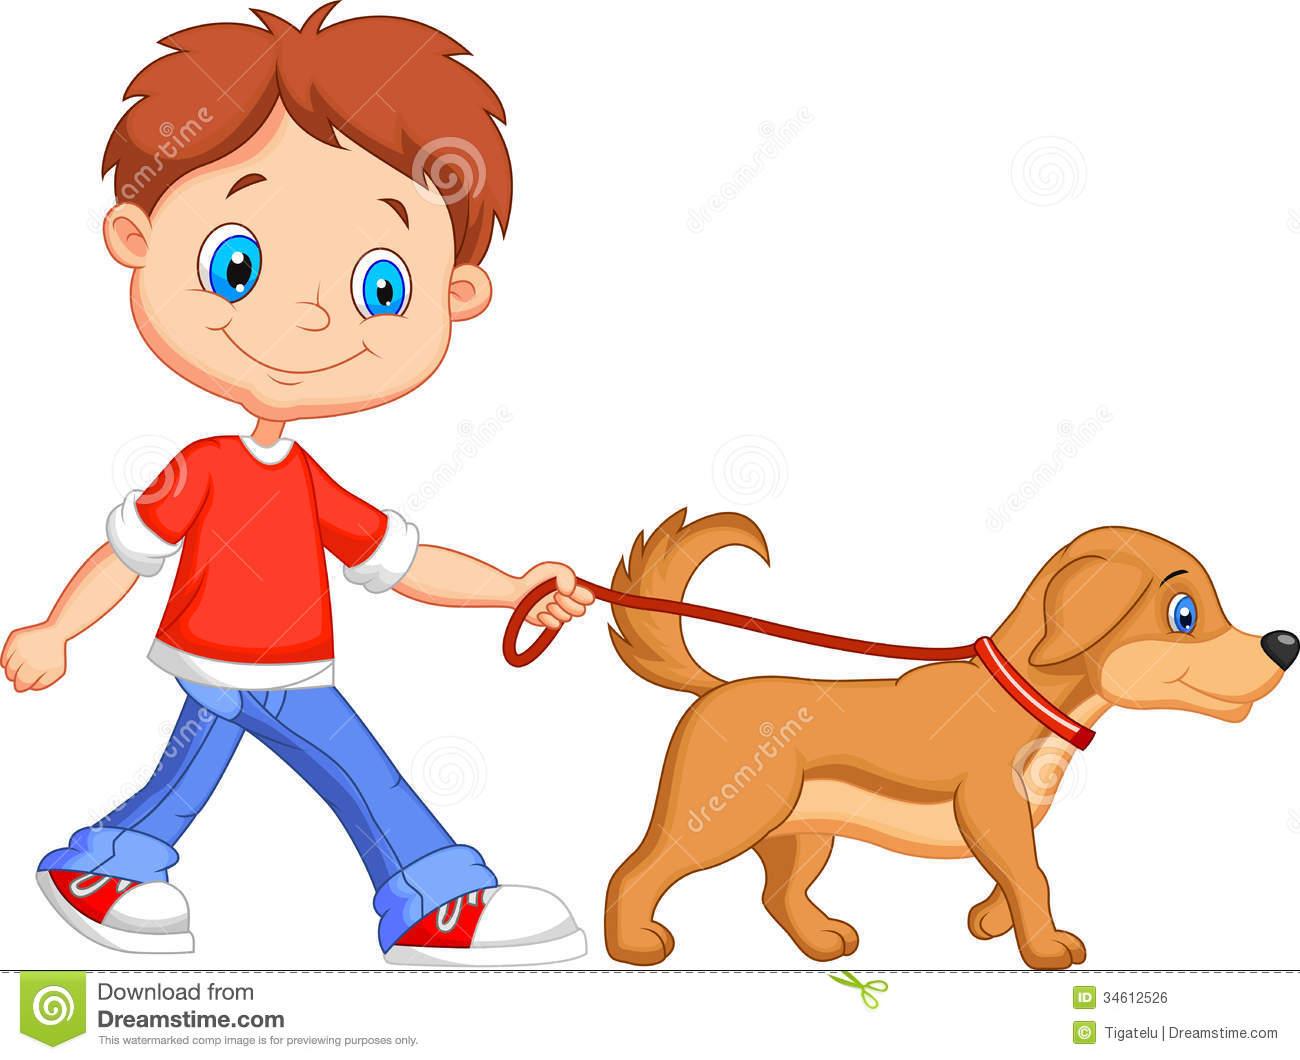 jpg download Girl walking dog clipart. Free cartoon download clip